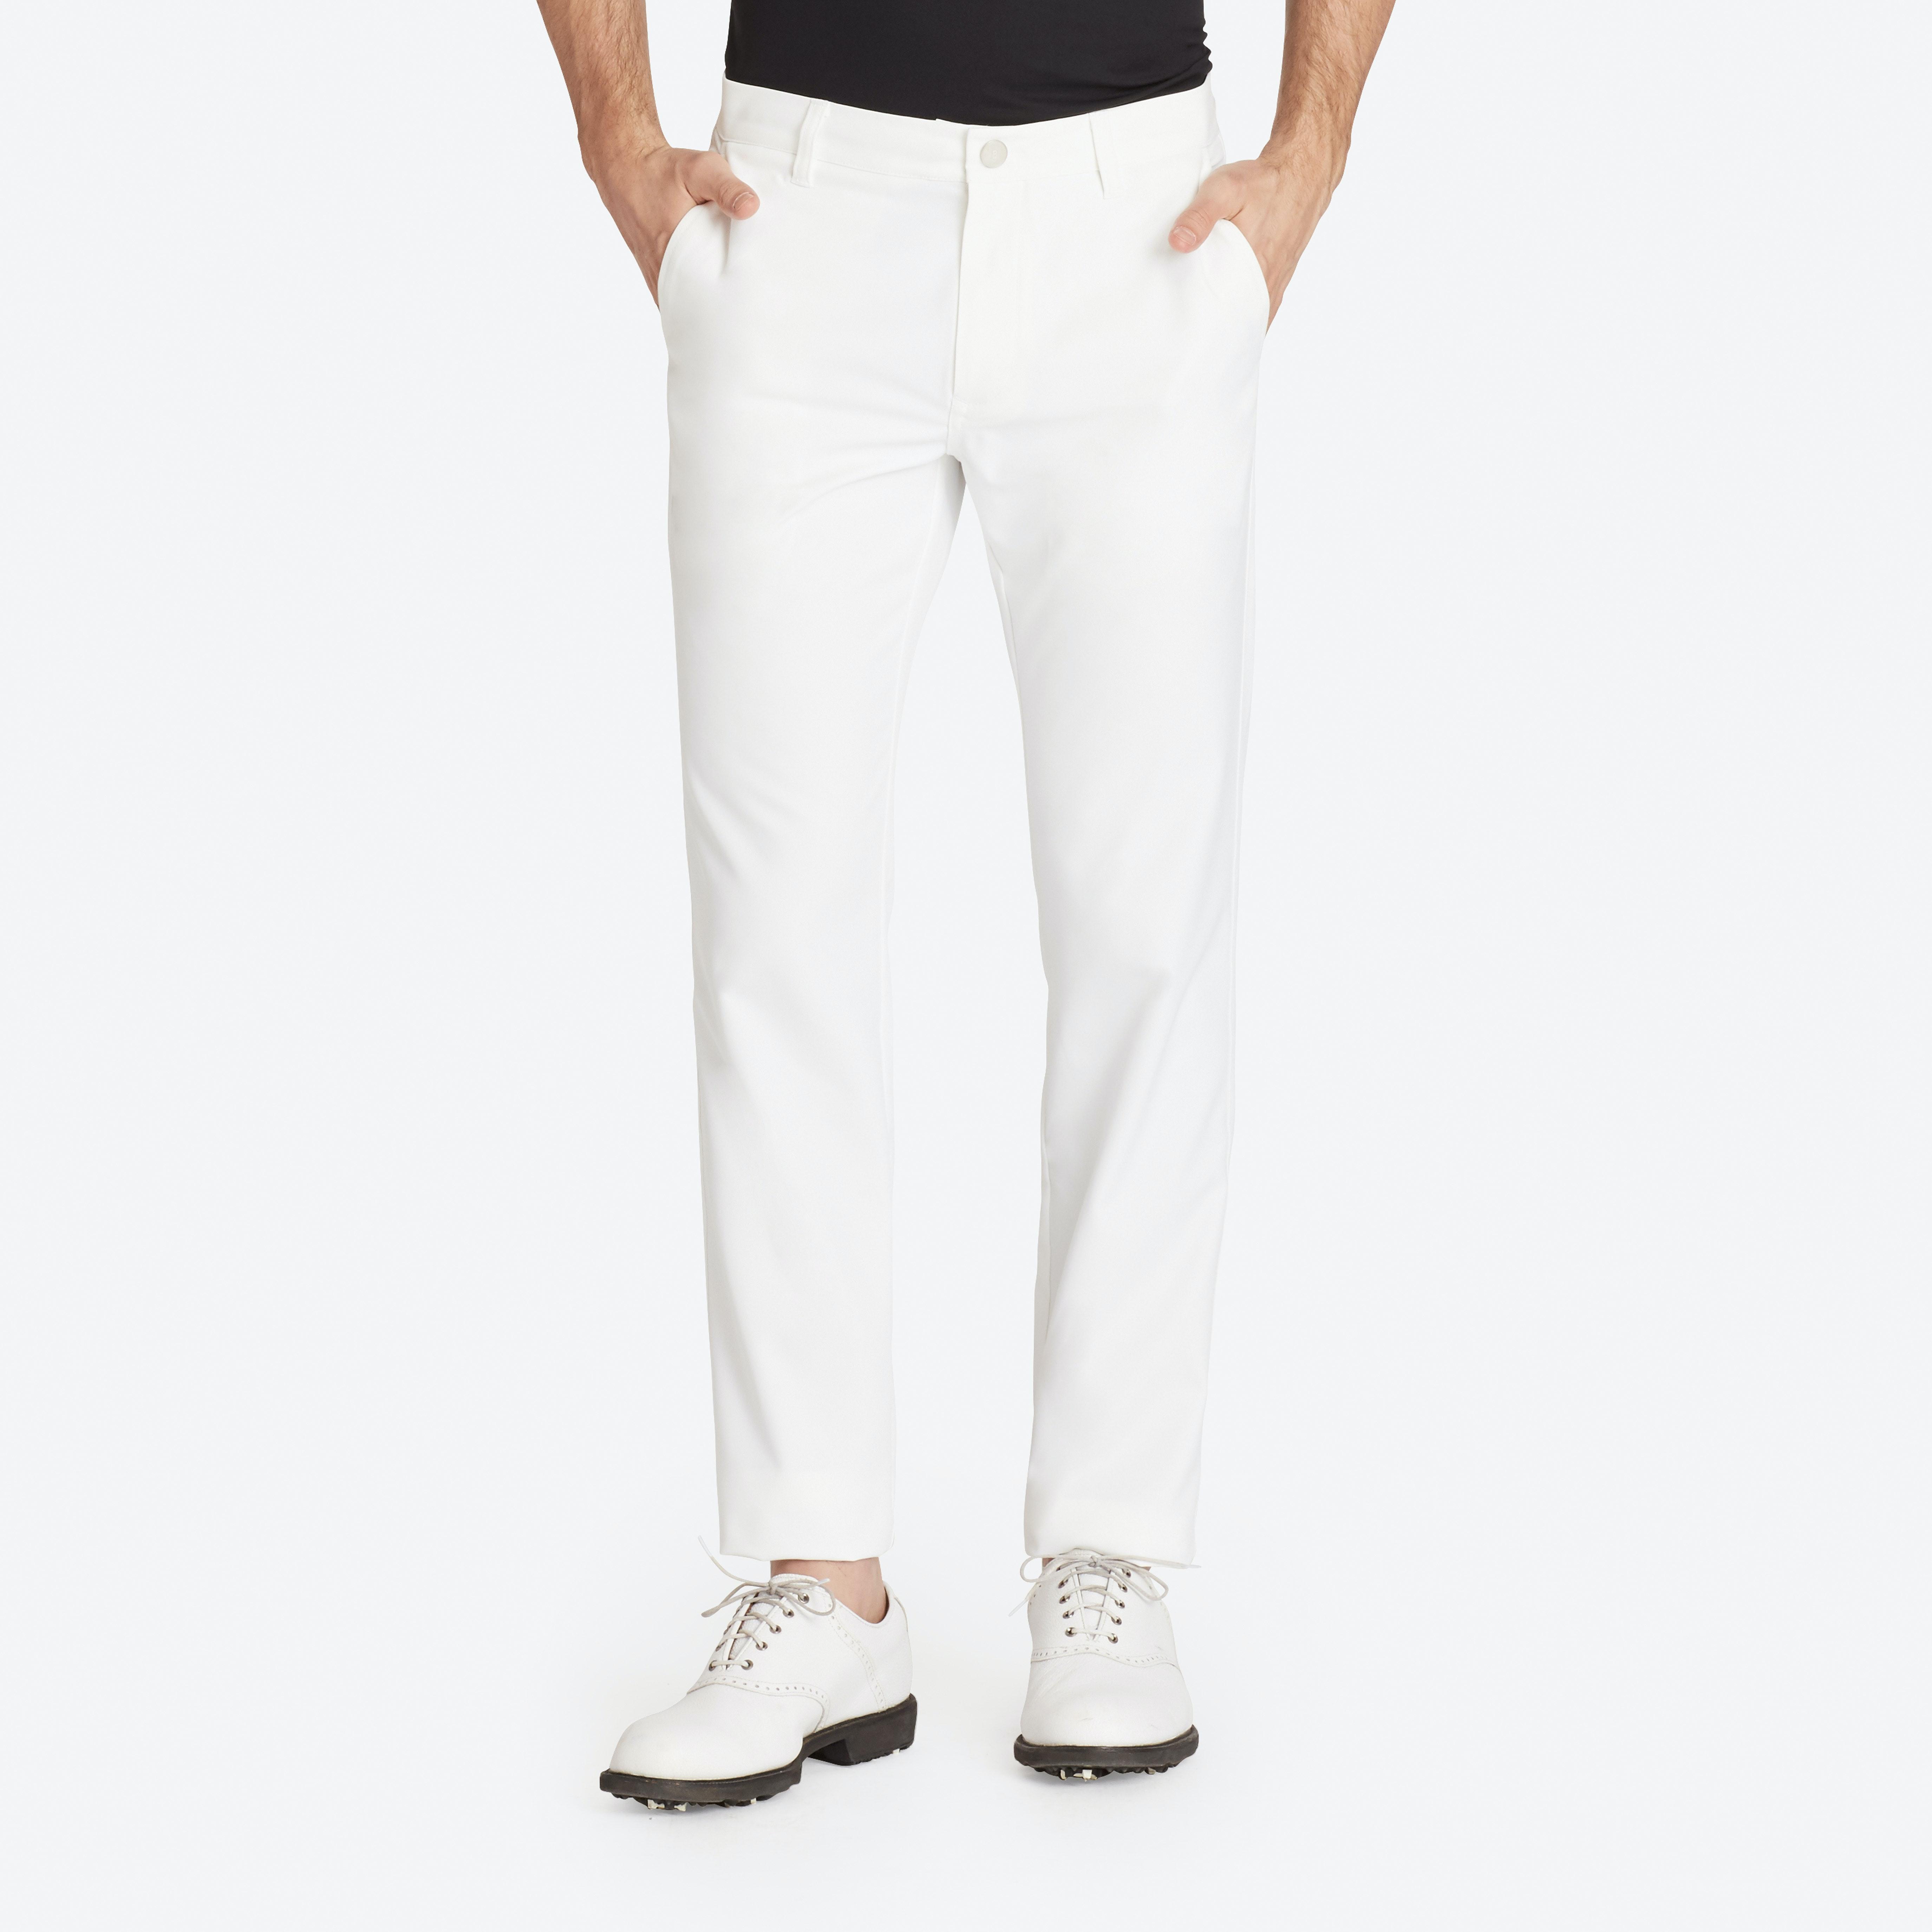 Highland Golf Pants